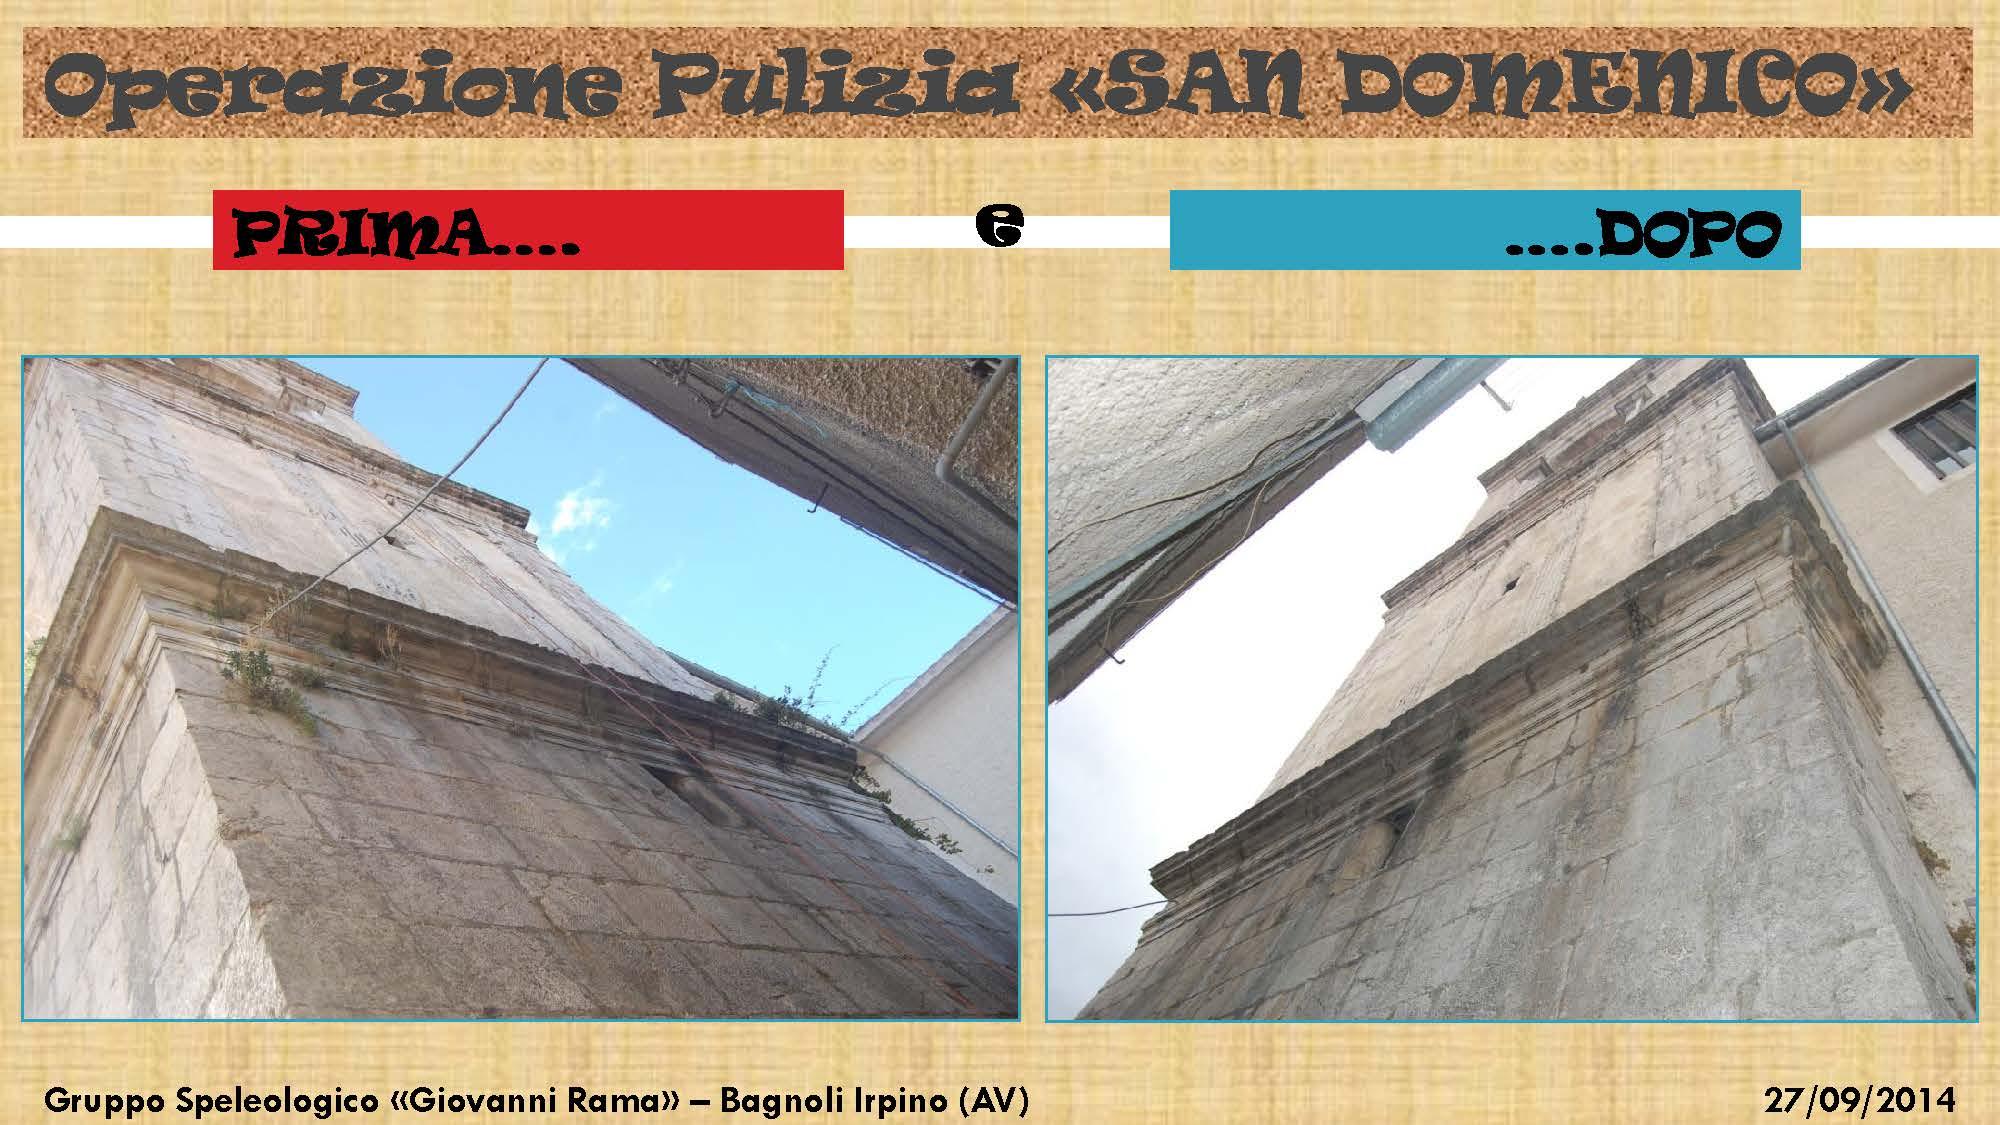 Bagnoli-Pulizia-San-Domenico-2014_Pagina_10